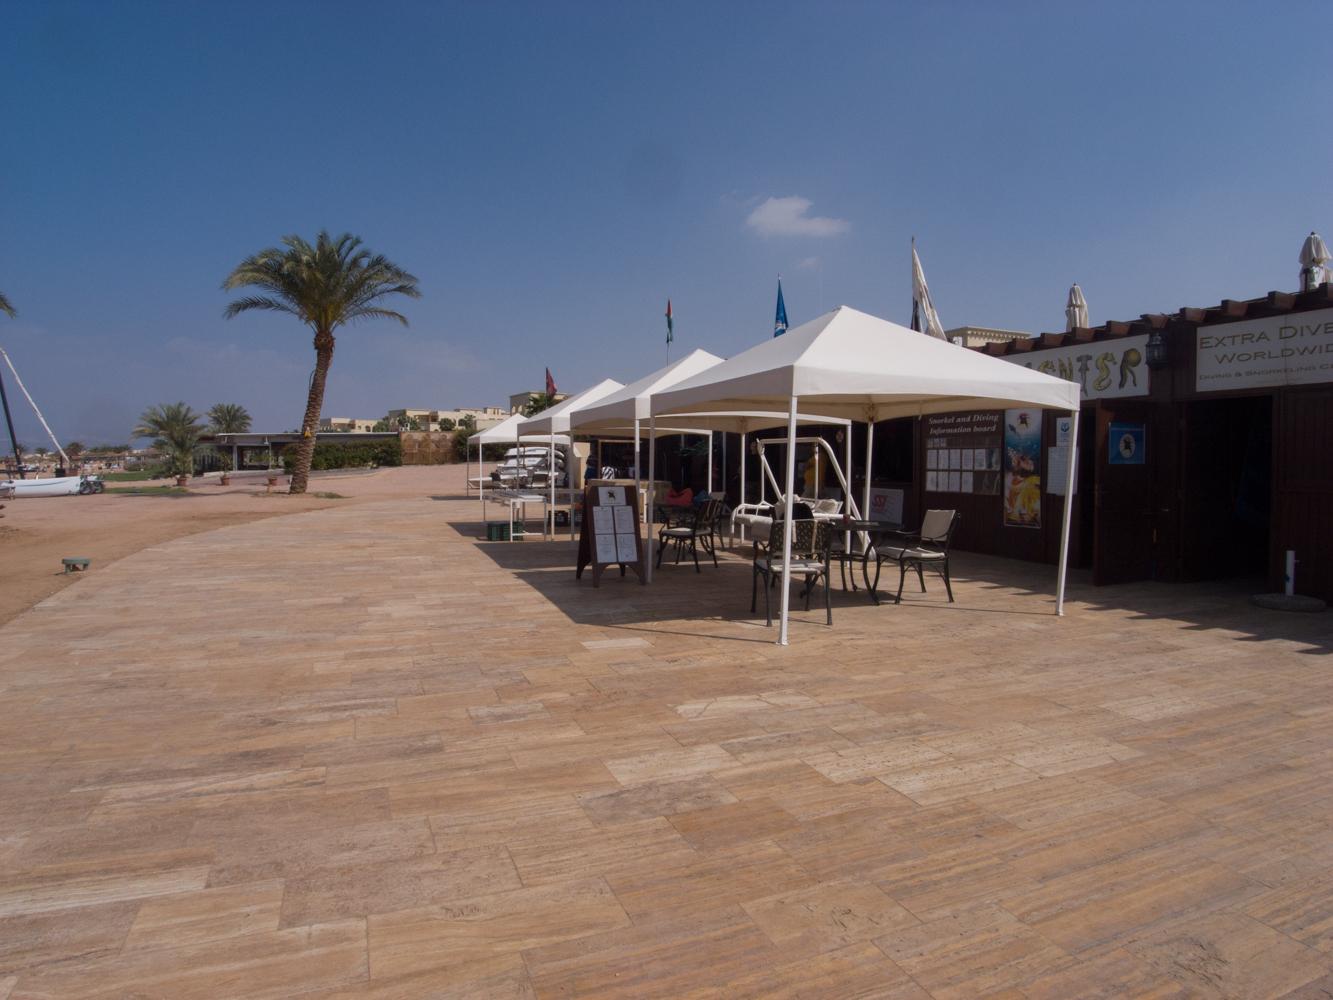 Jordanien_Aqaba_Rotes_Meer_Amman_Fotos-4